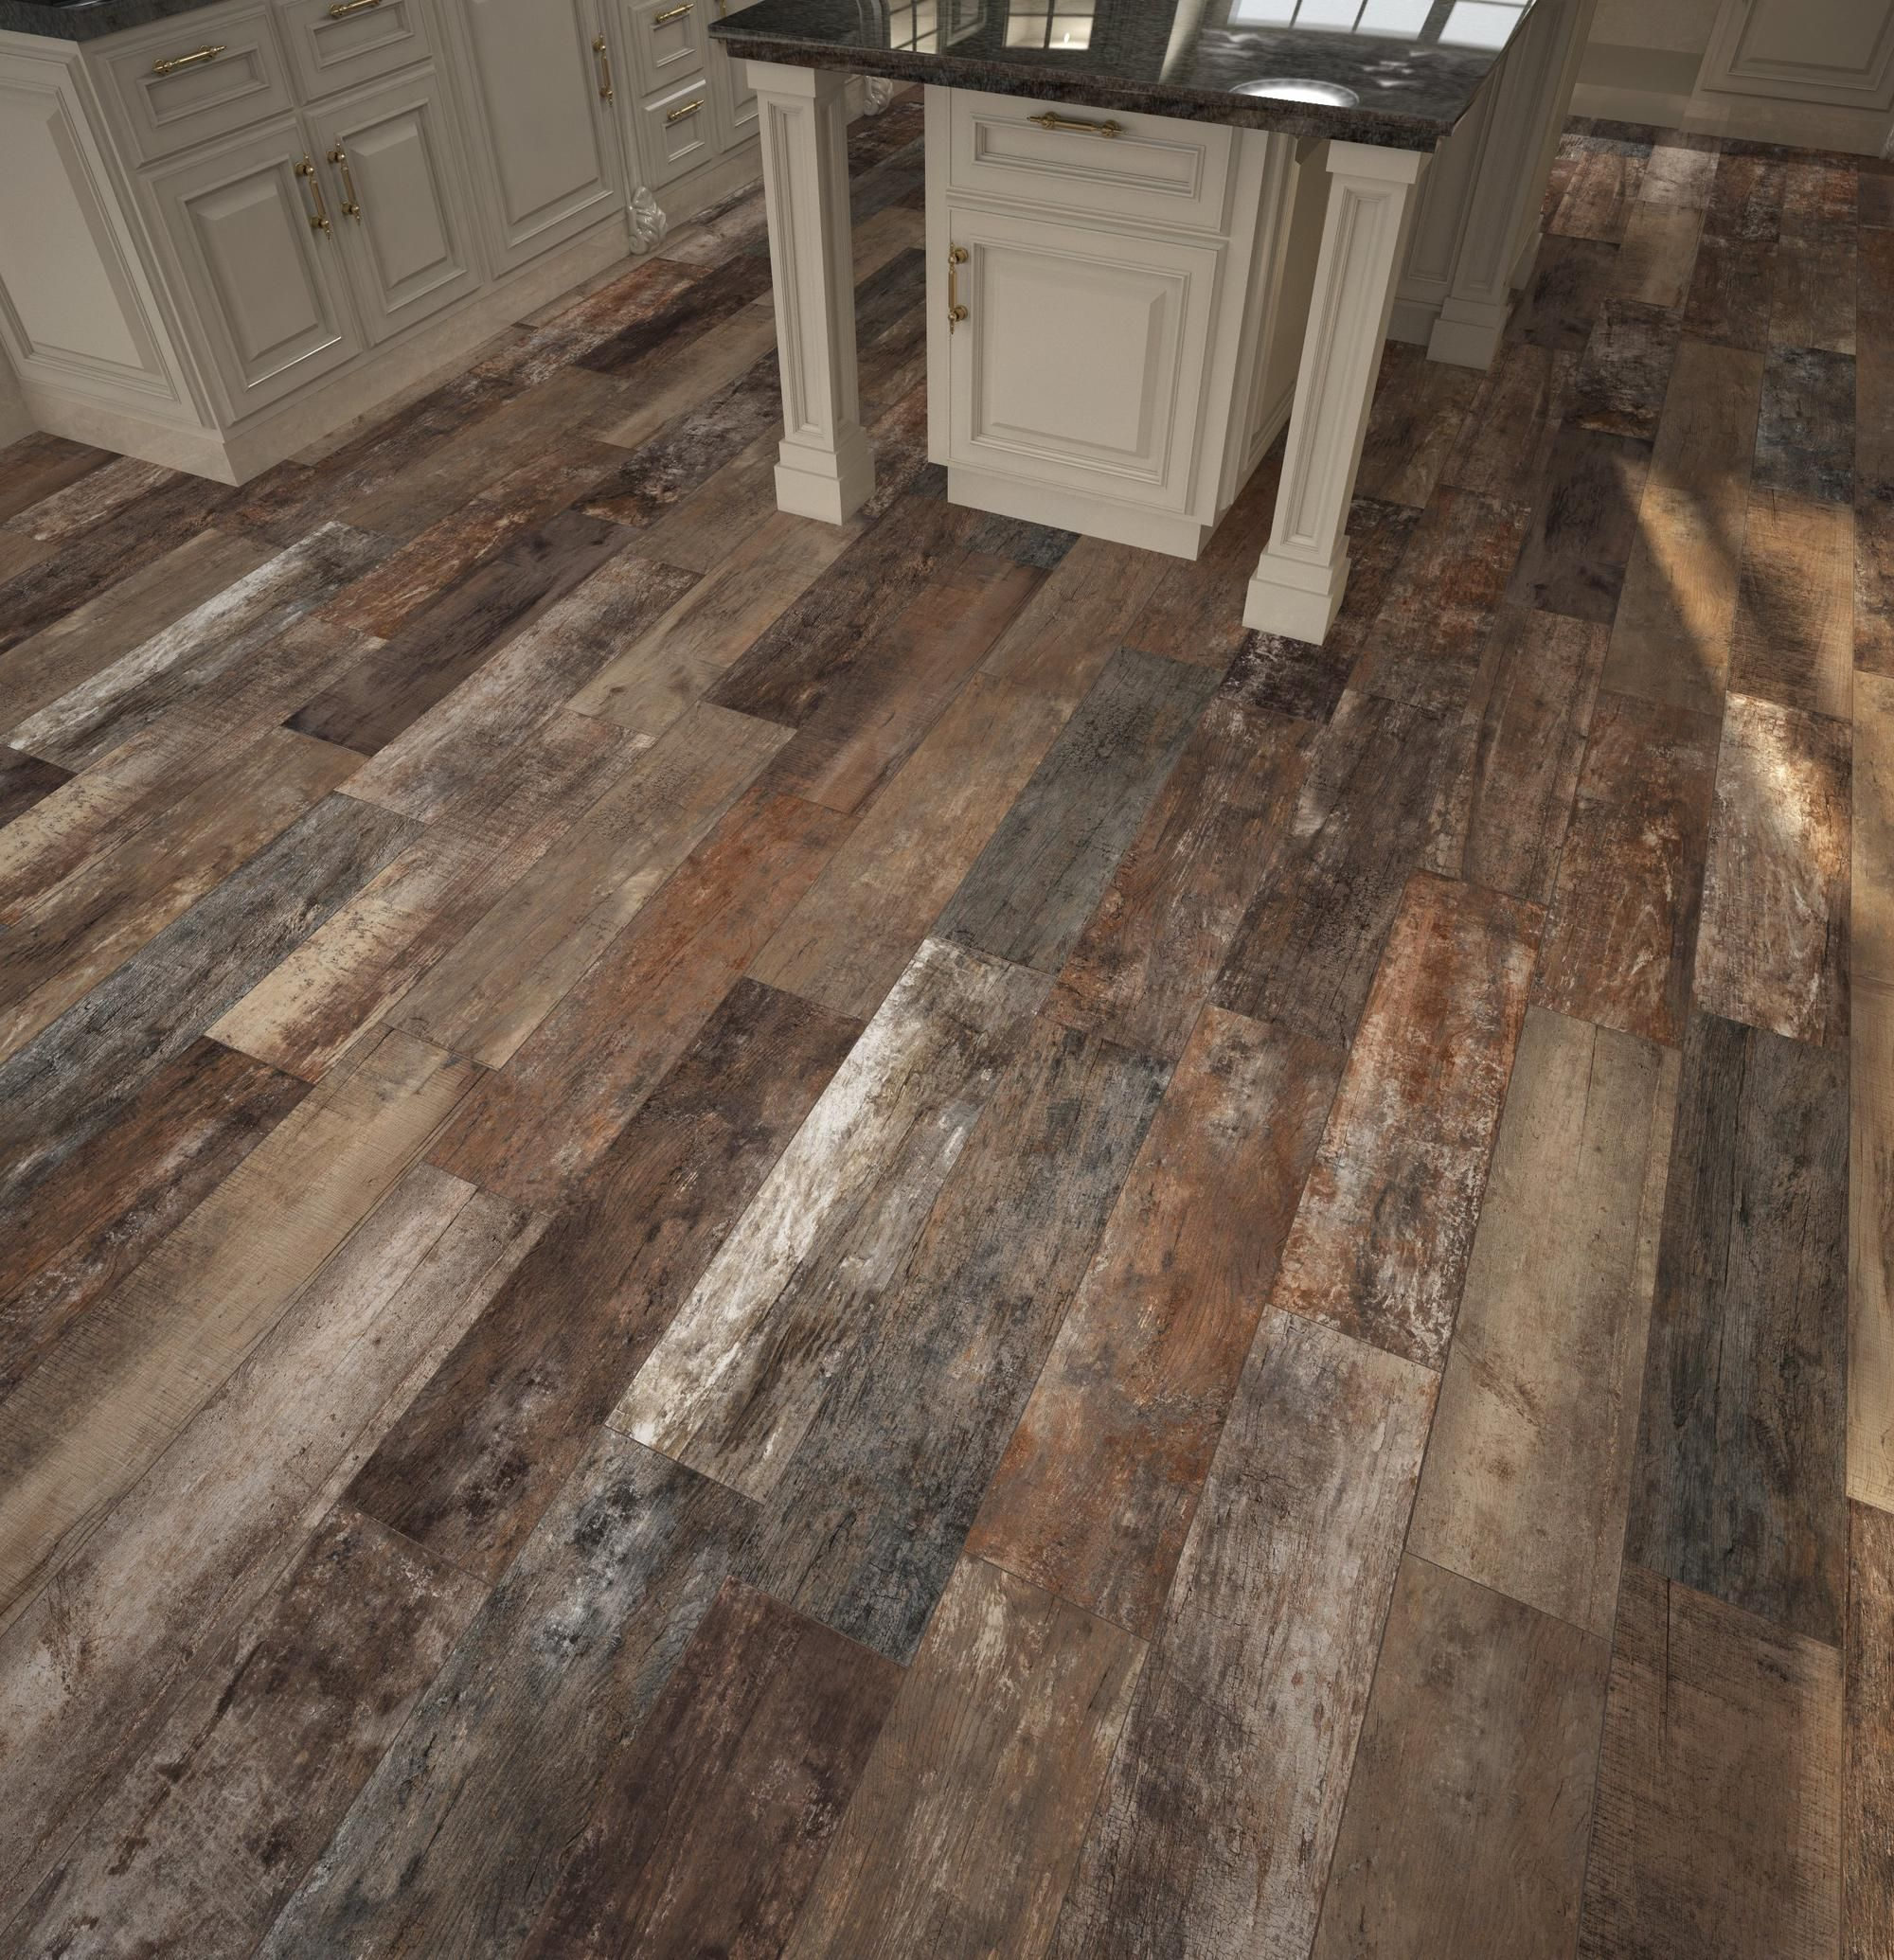 Floor And Decor Wood Look Tile Roanoke Multi Wood Plank Porcelain Tile  Wood Planks Porcelain